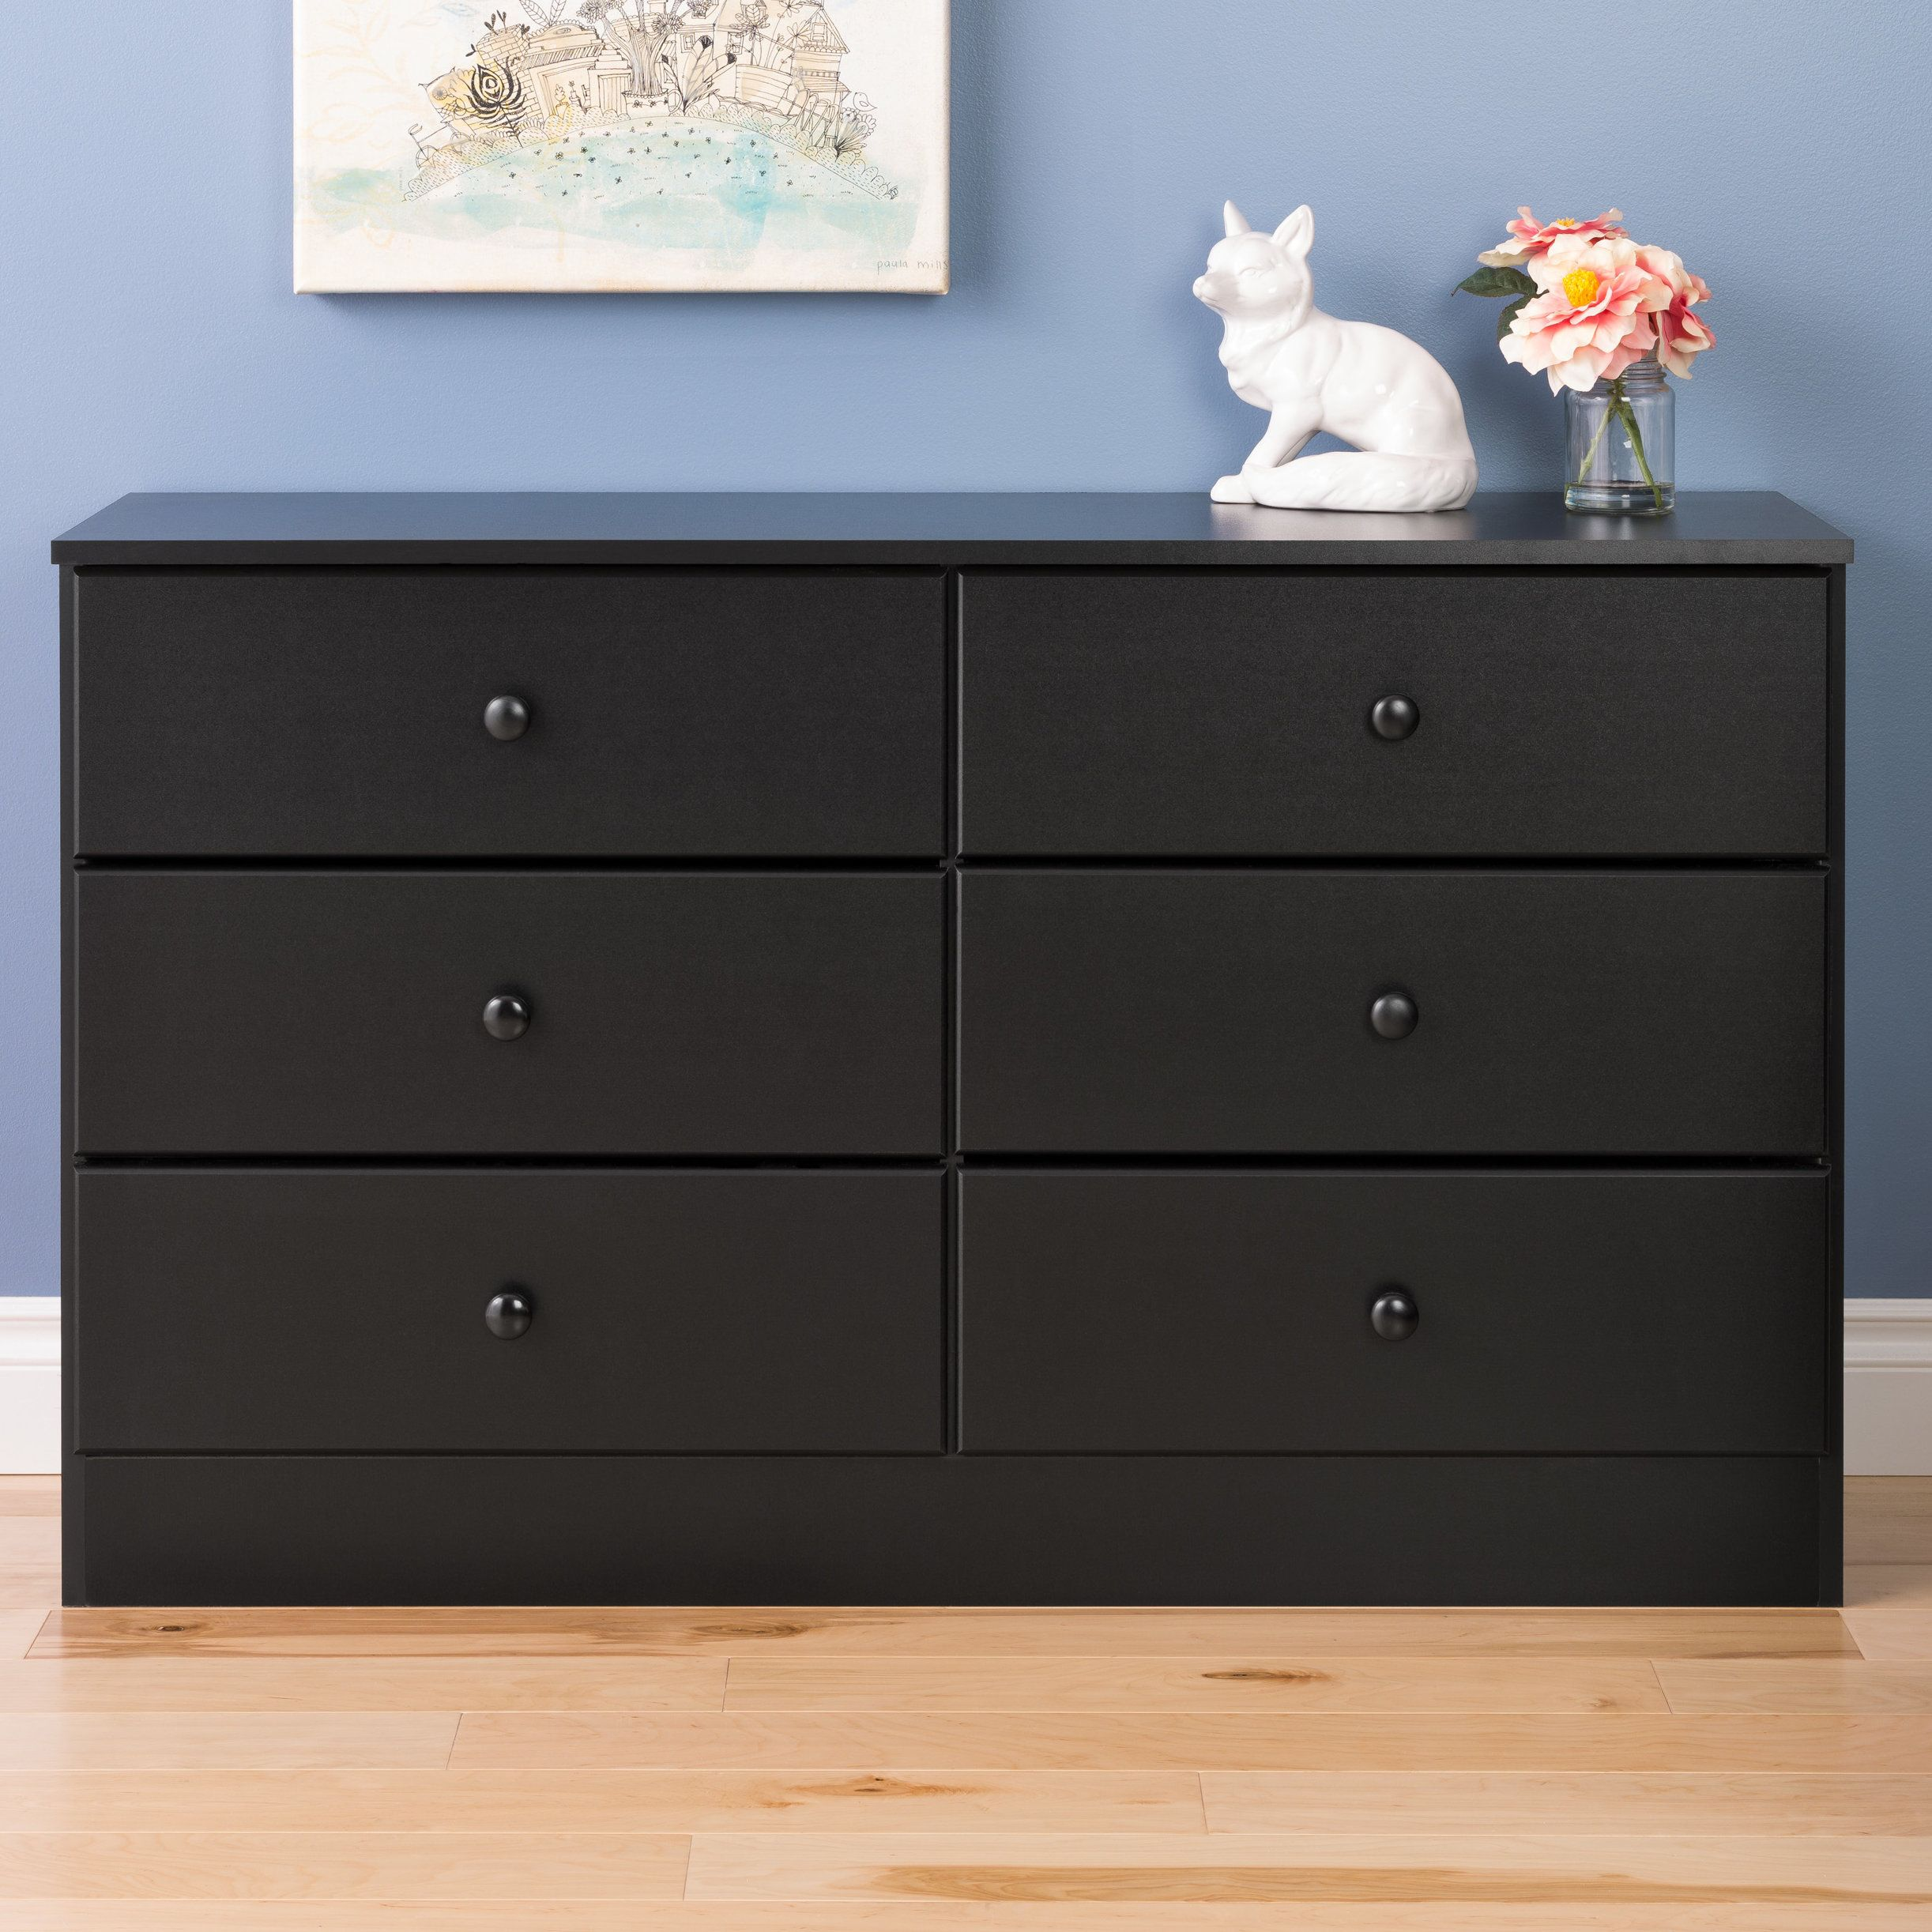 Doyle 6 Drawer Double Dresser Six Drawer Dresser Dresser 6 Drawer Dresser [ 2445 x 2445 Pixel ]